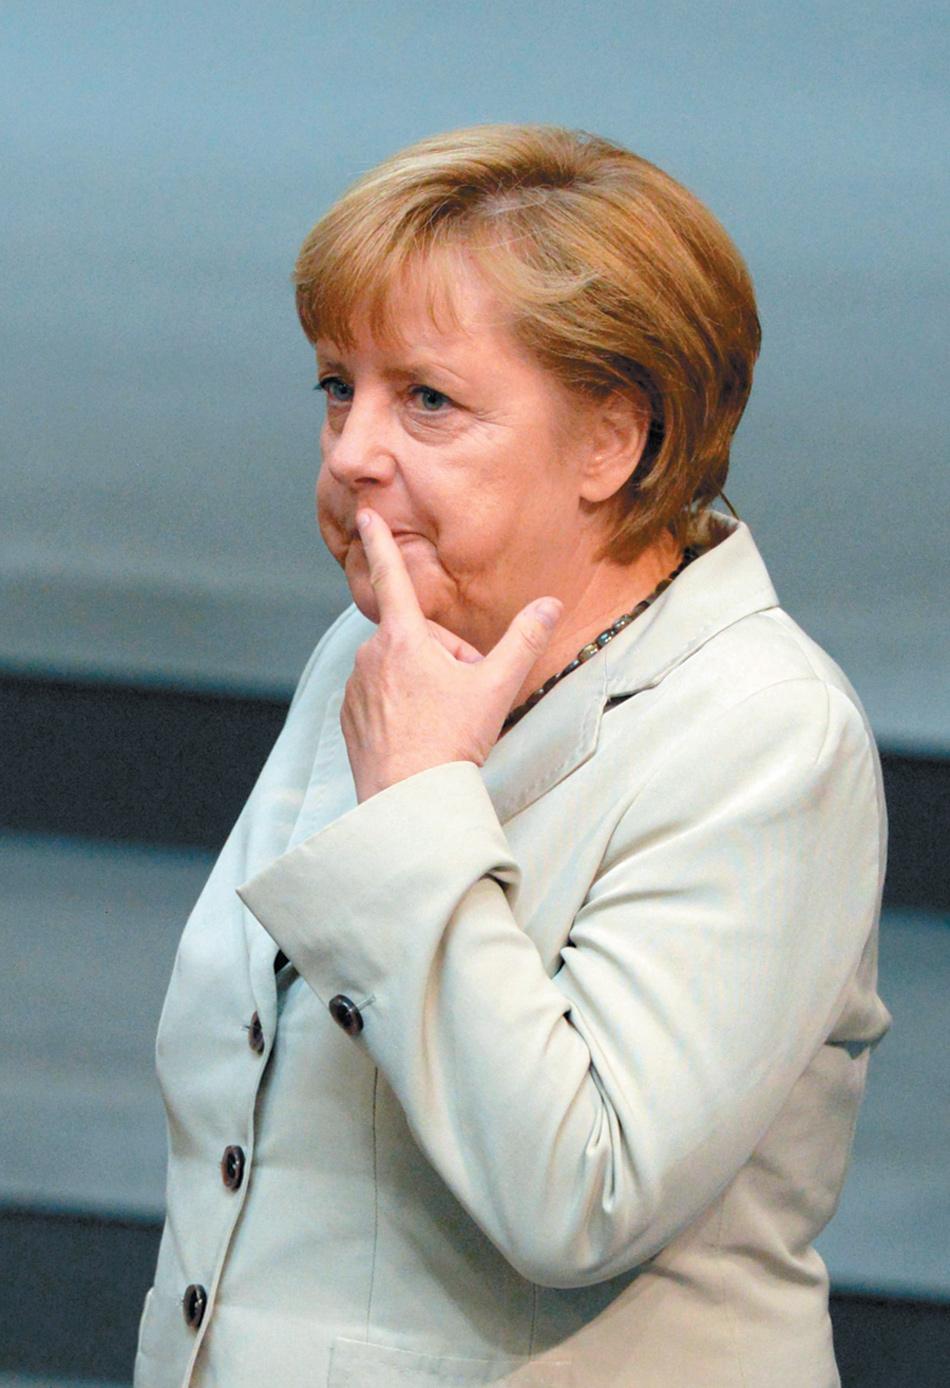 German Chancellor Angela Merkel, Berlin, September 2012